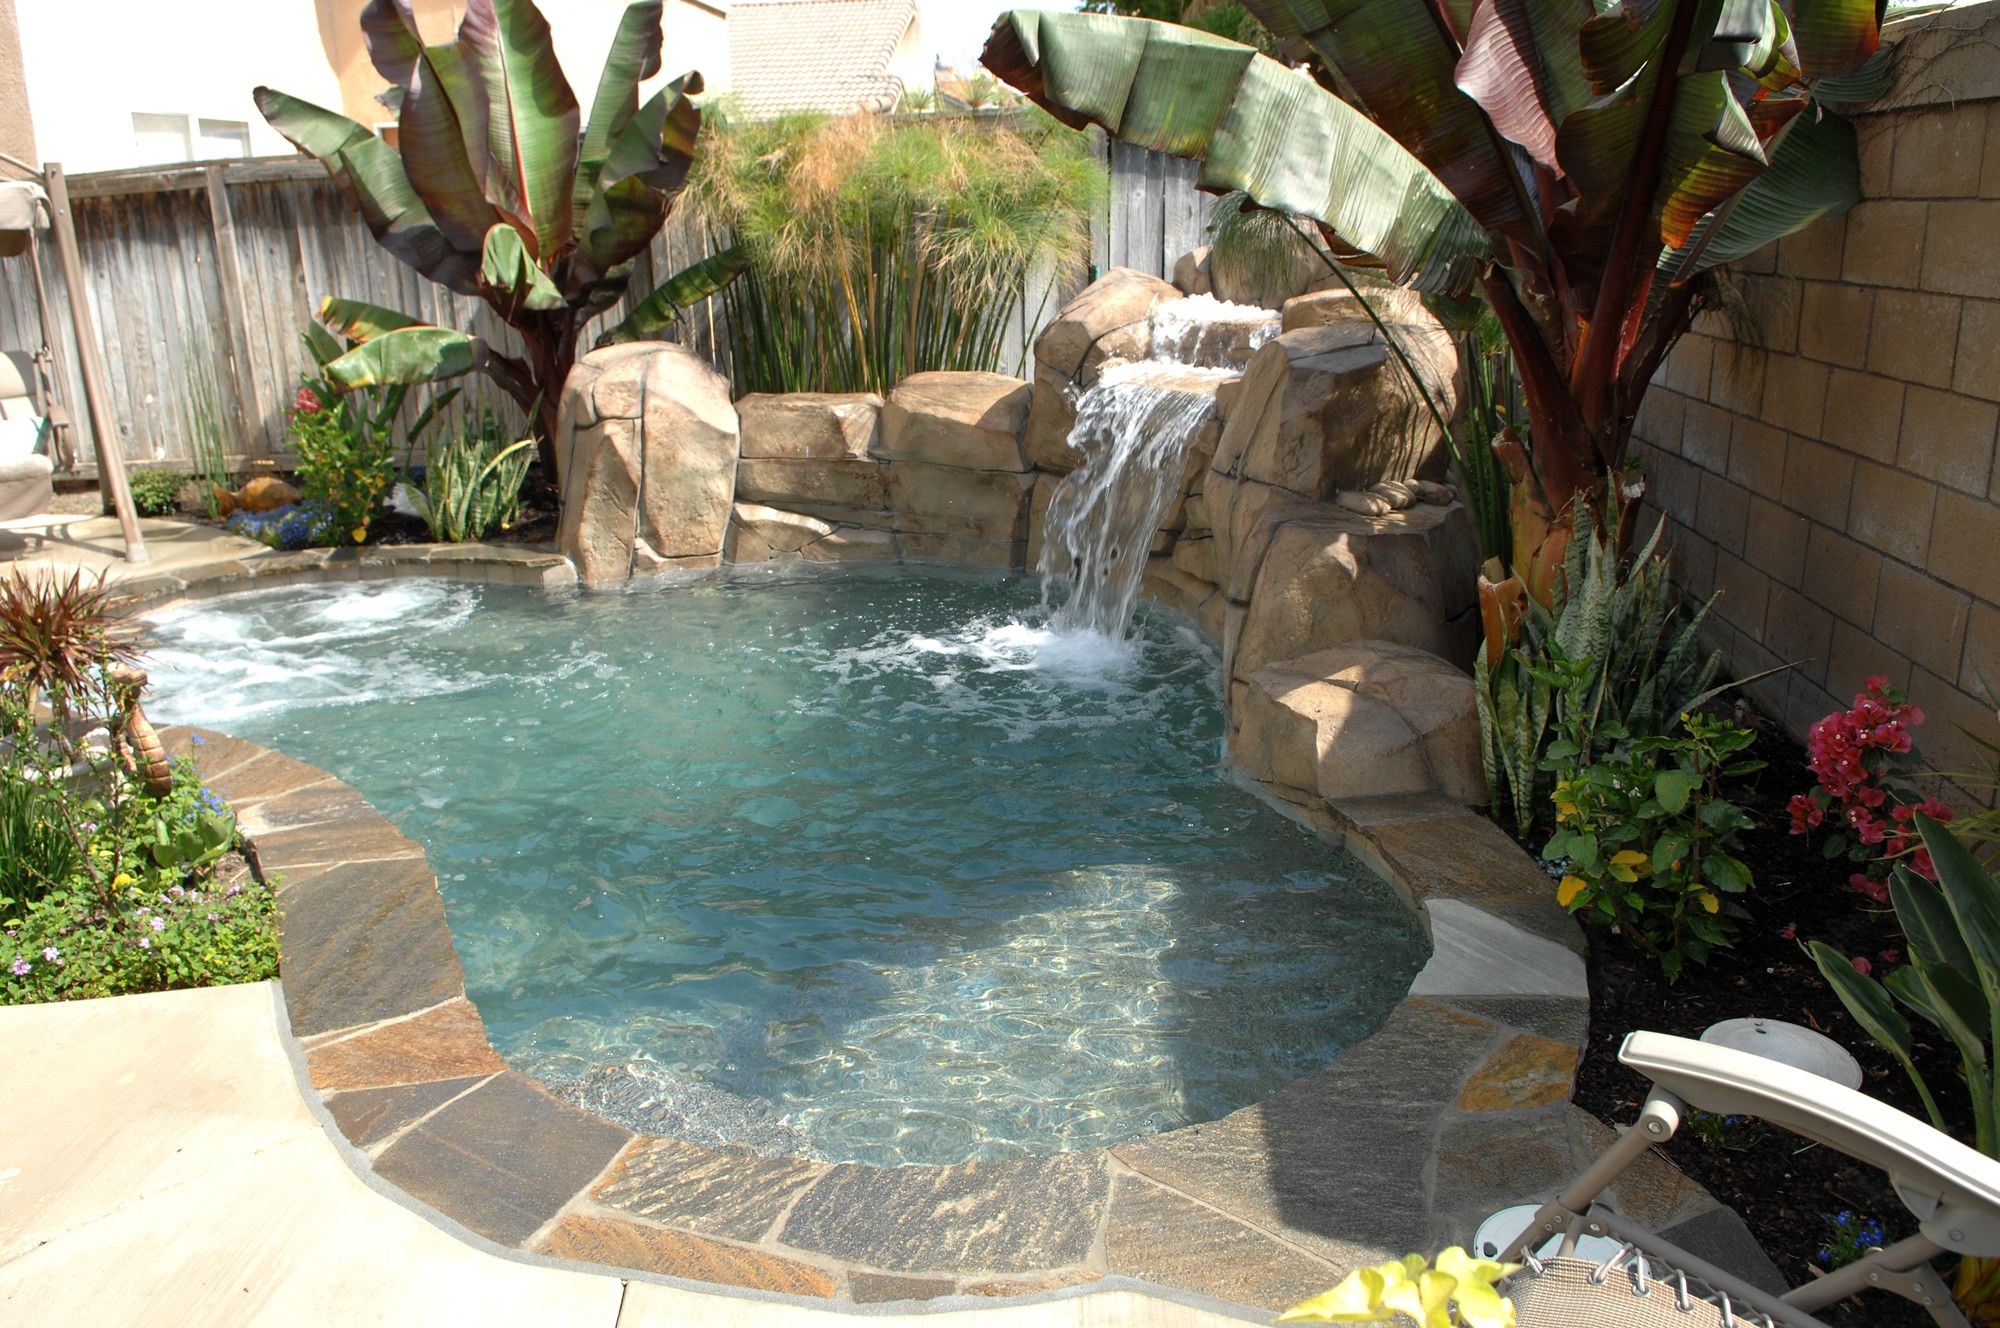 Spa Rock Waterfall Chino Pools Backyard Inground Swimming Pools Backyard Garden Pool Design